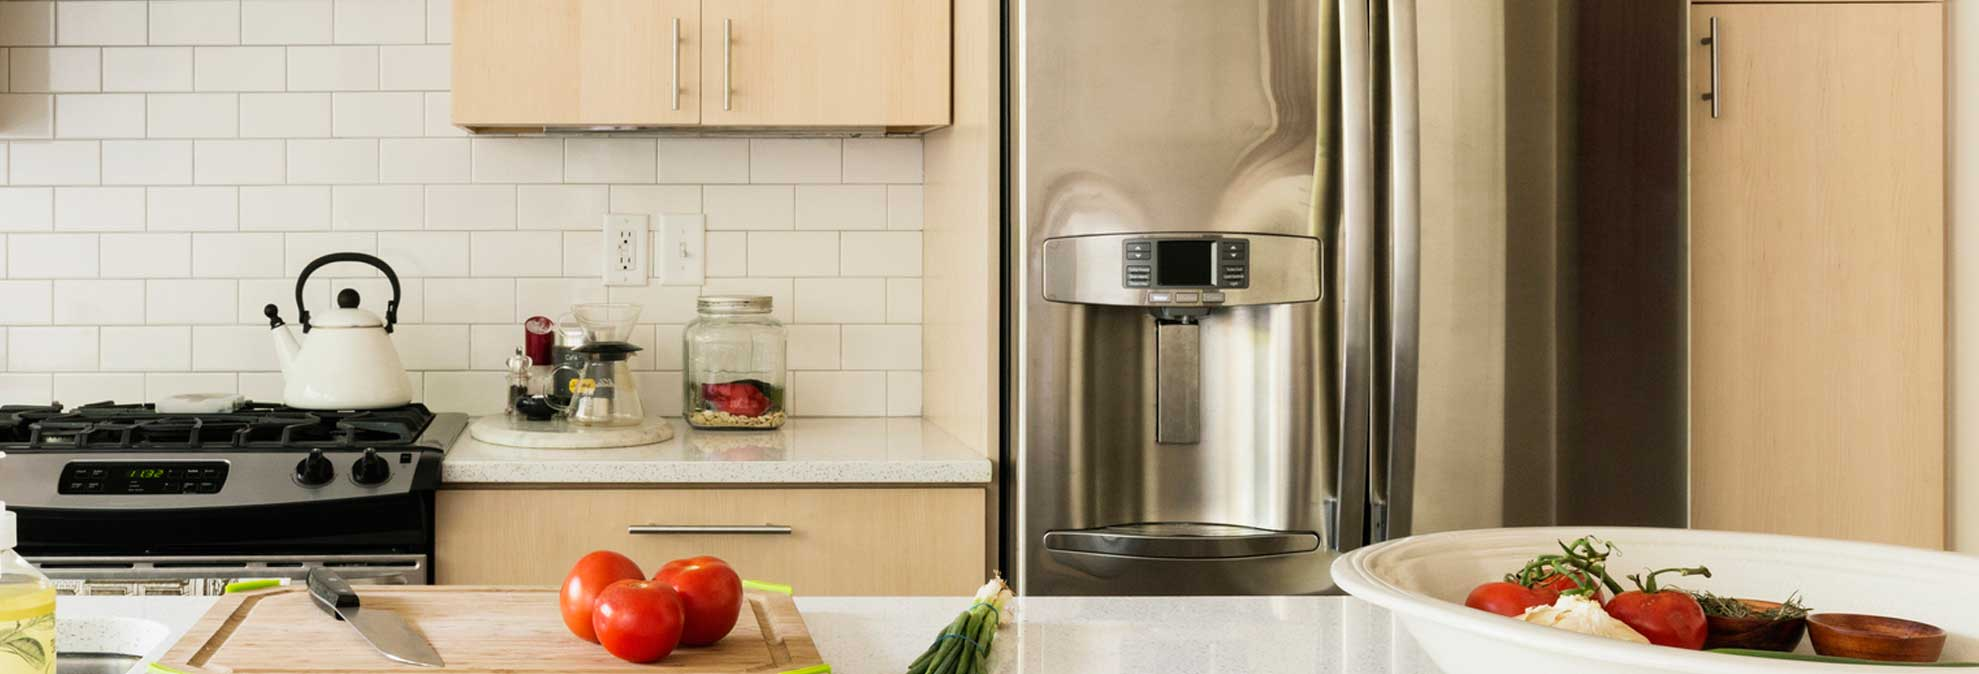 Best Home Kitchen Appliances Best Refrigerators Of 2016 Consumer Reports